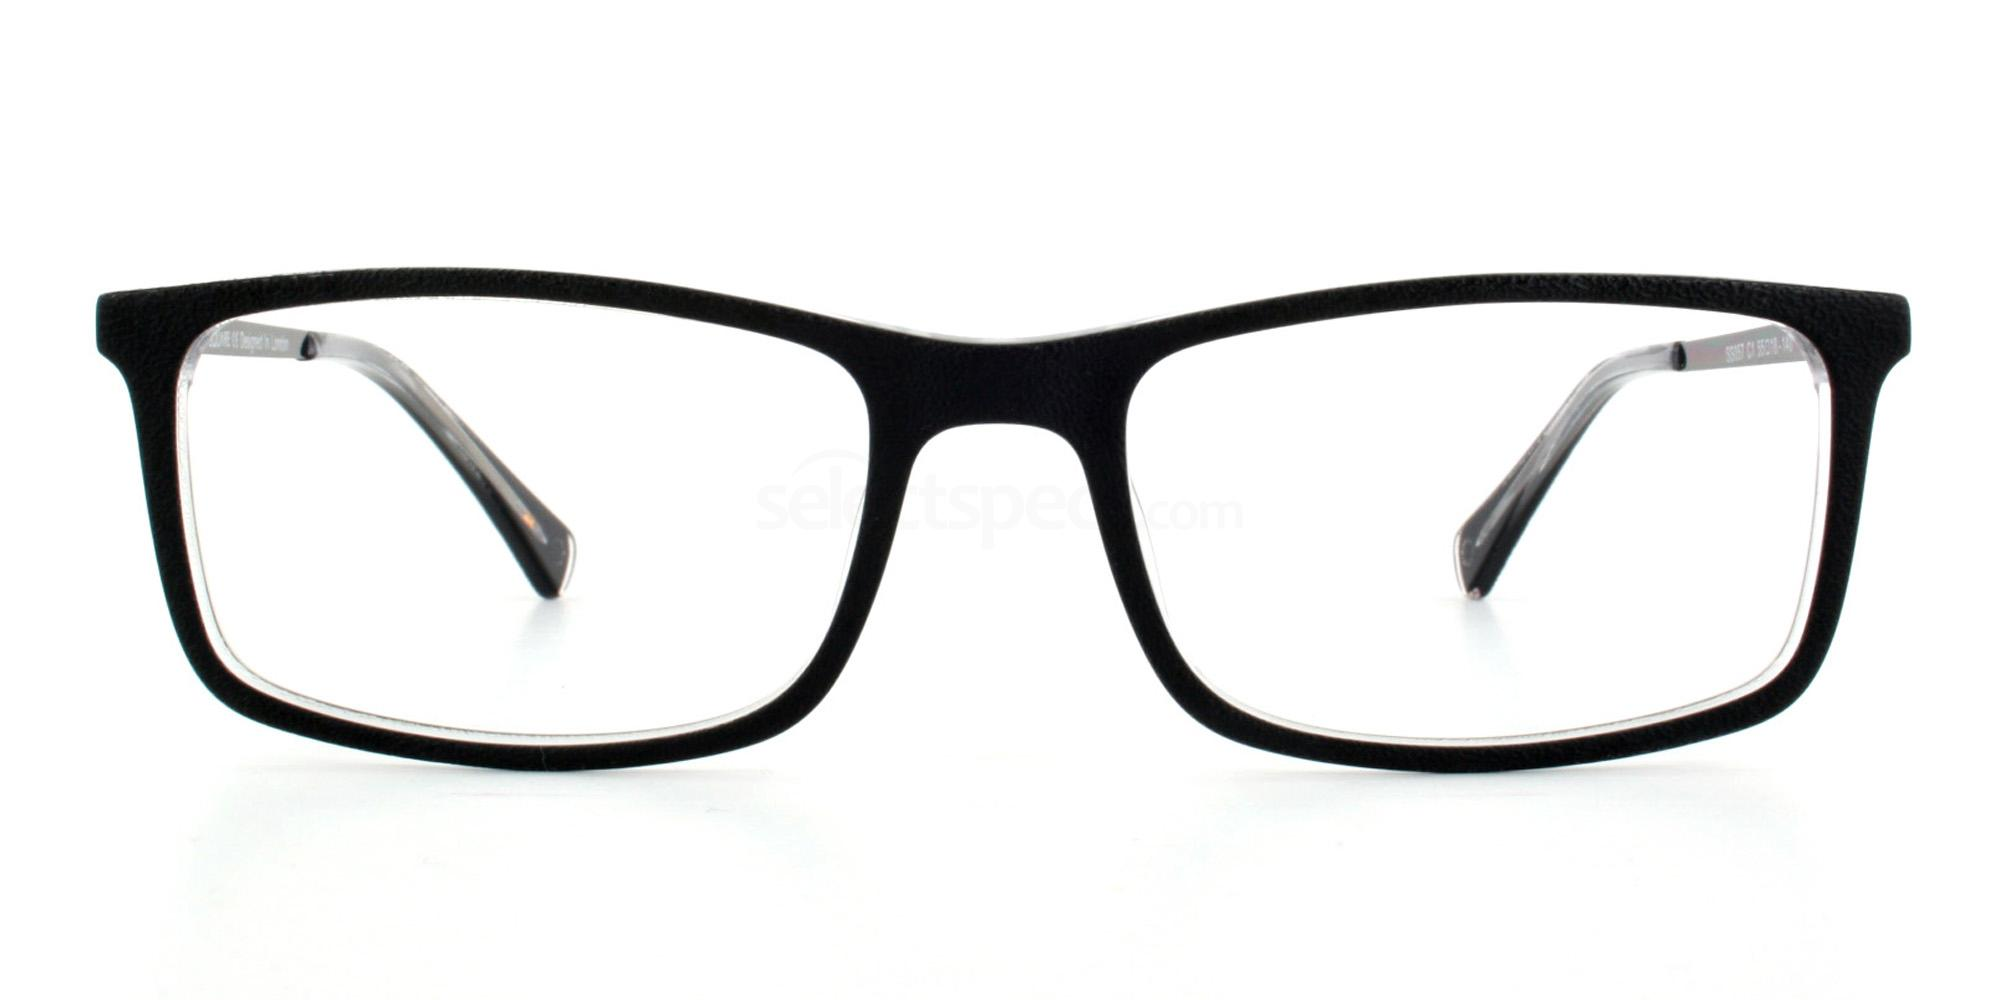 C1 SS 057 Glasses, Soho Square